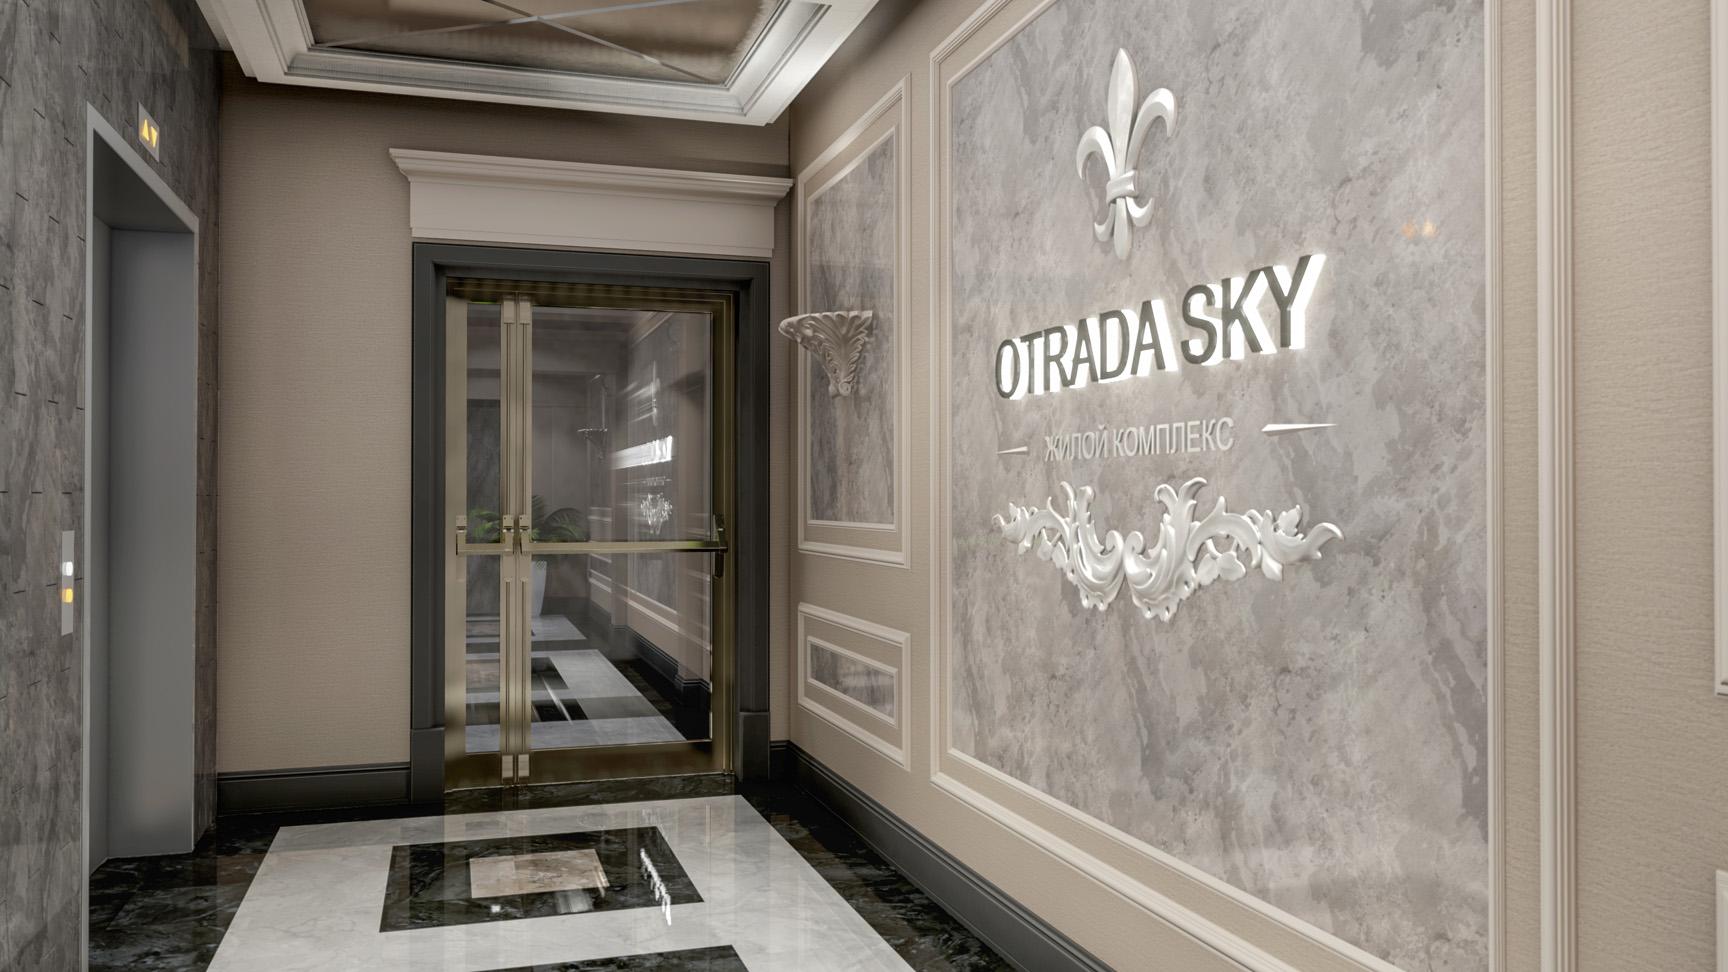 OTRADA SKY (Отрада Скай)